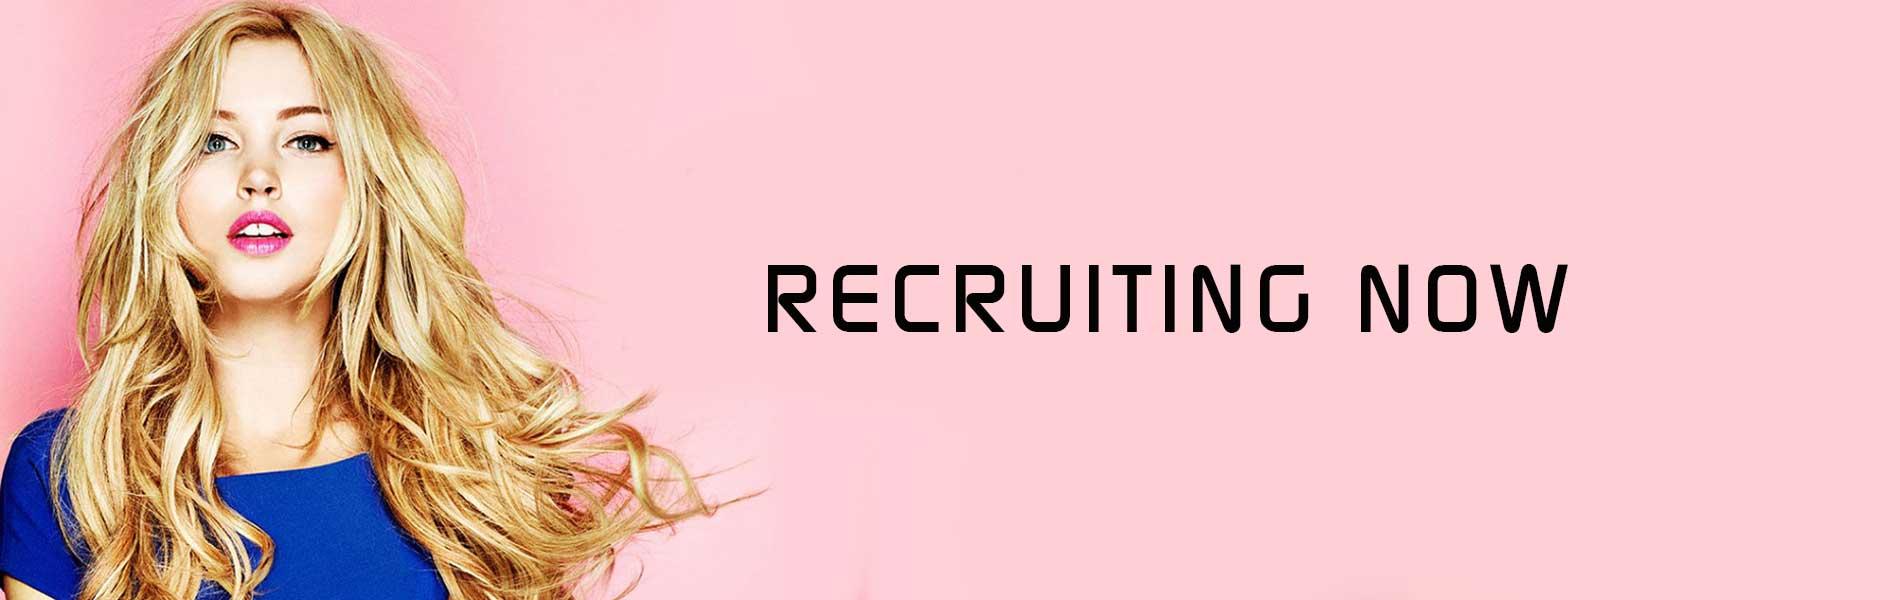 Kevin Joseph Uxbridge Hairdressers Recruiting Now